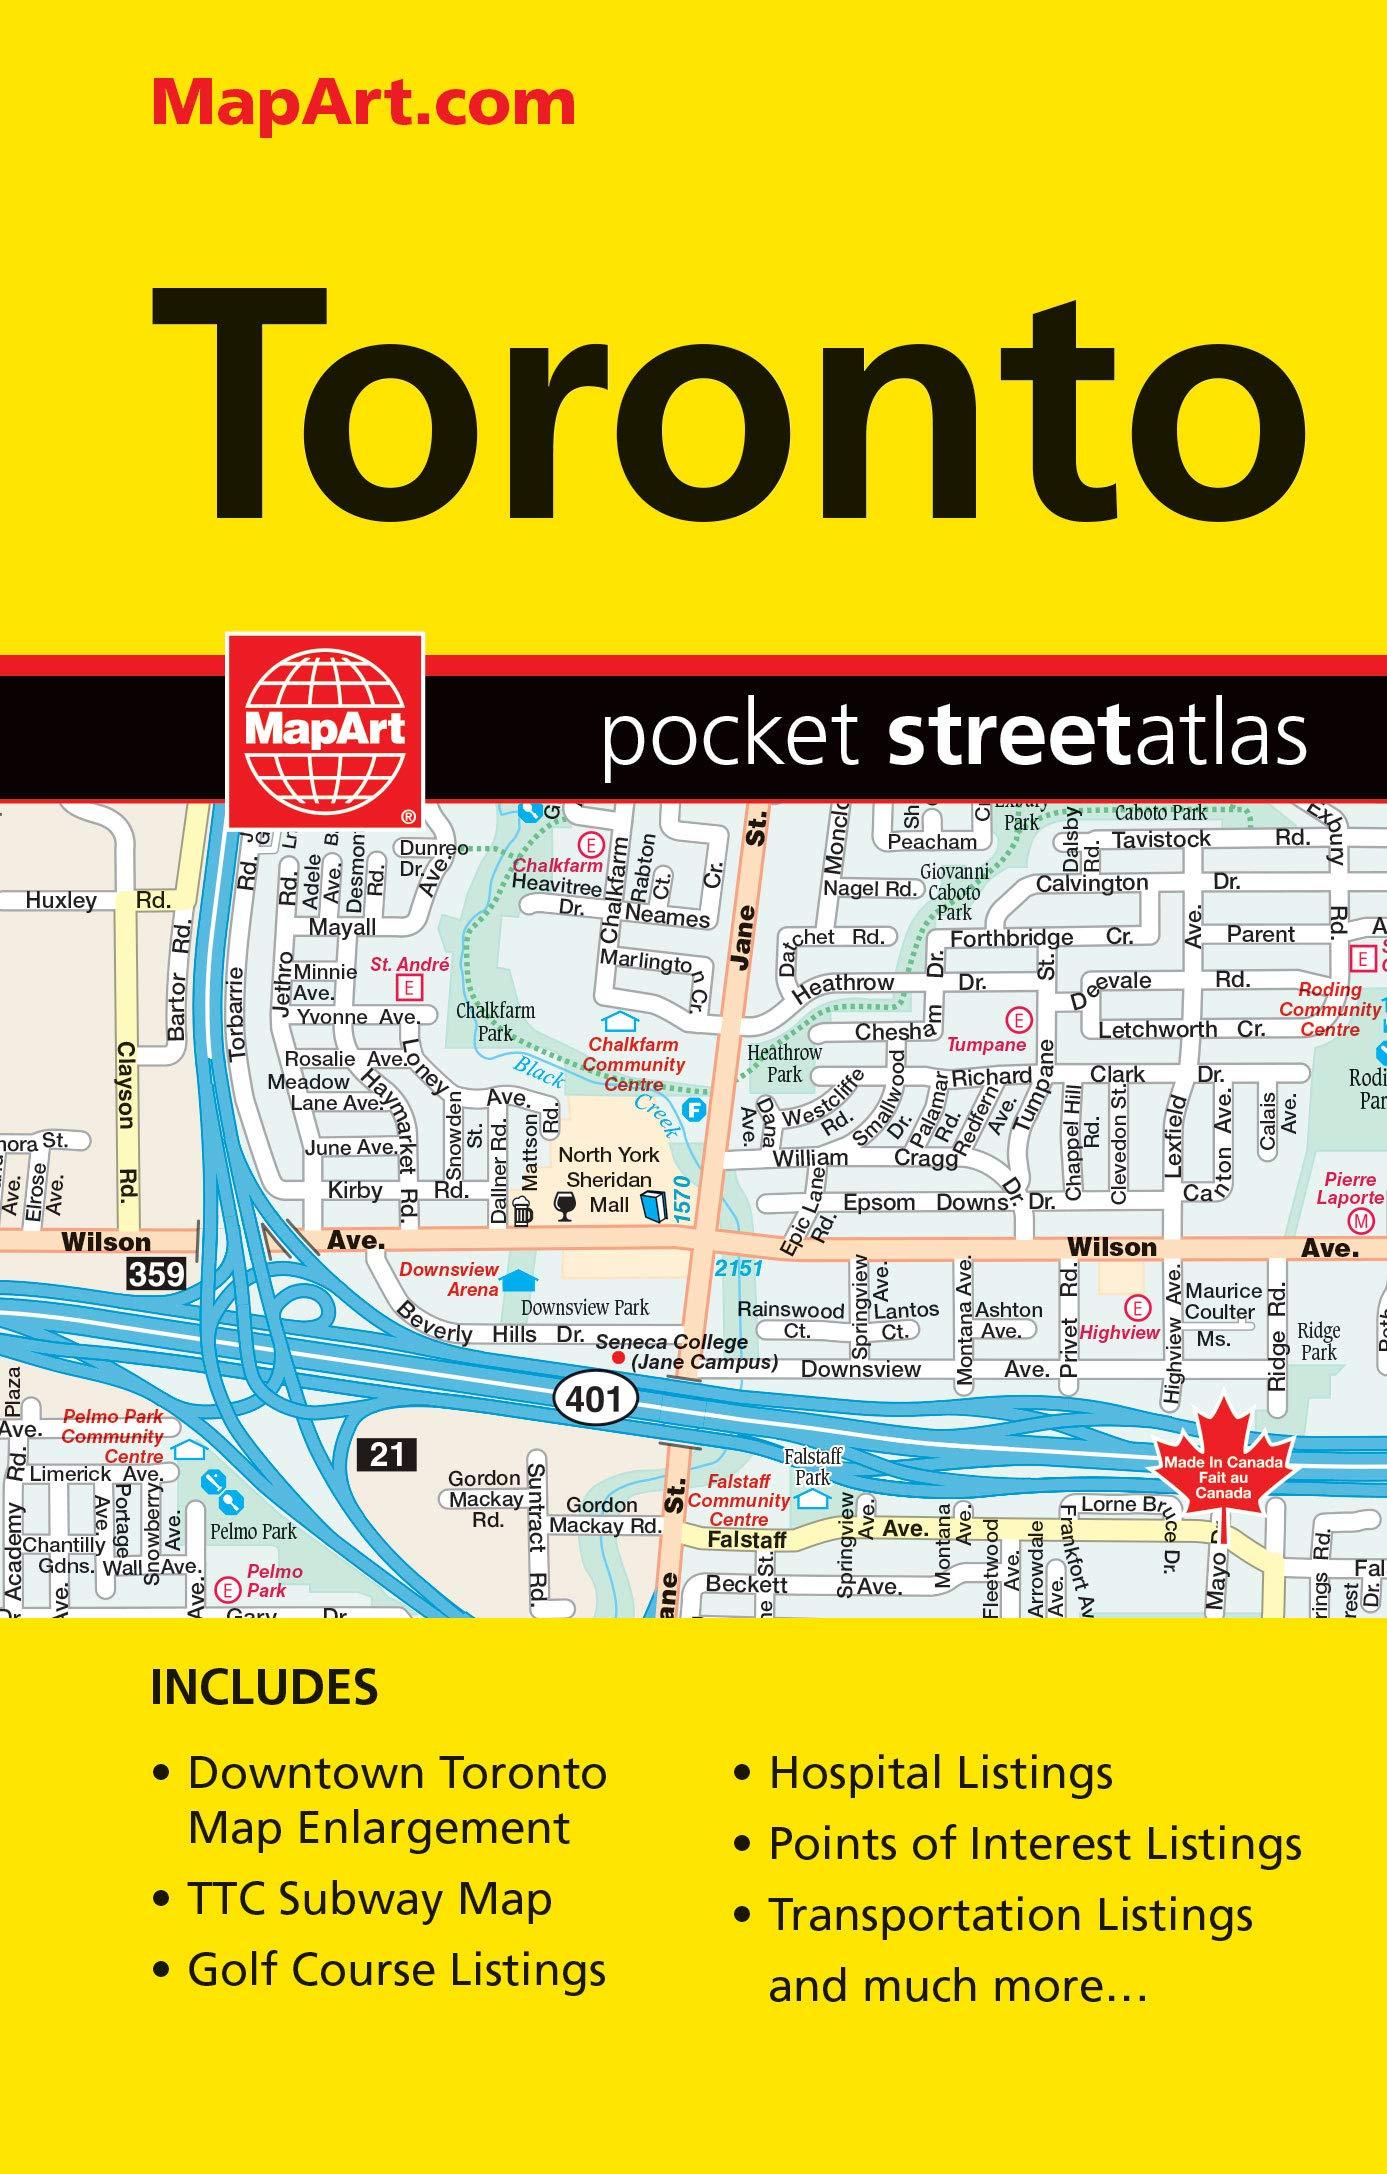 Toronto Subway Map Poster.Toronto On Pocket Street Atlas Mapart Publishing Mapart